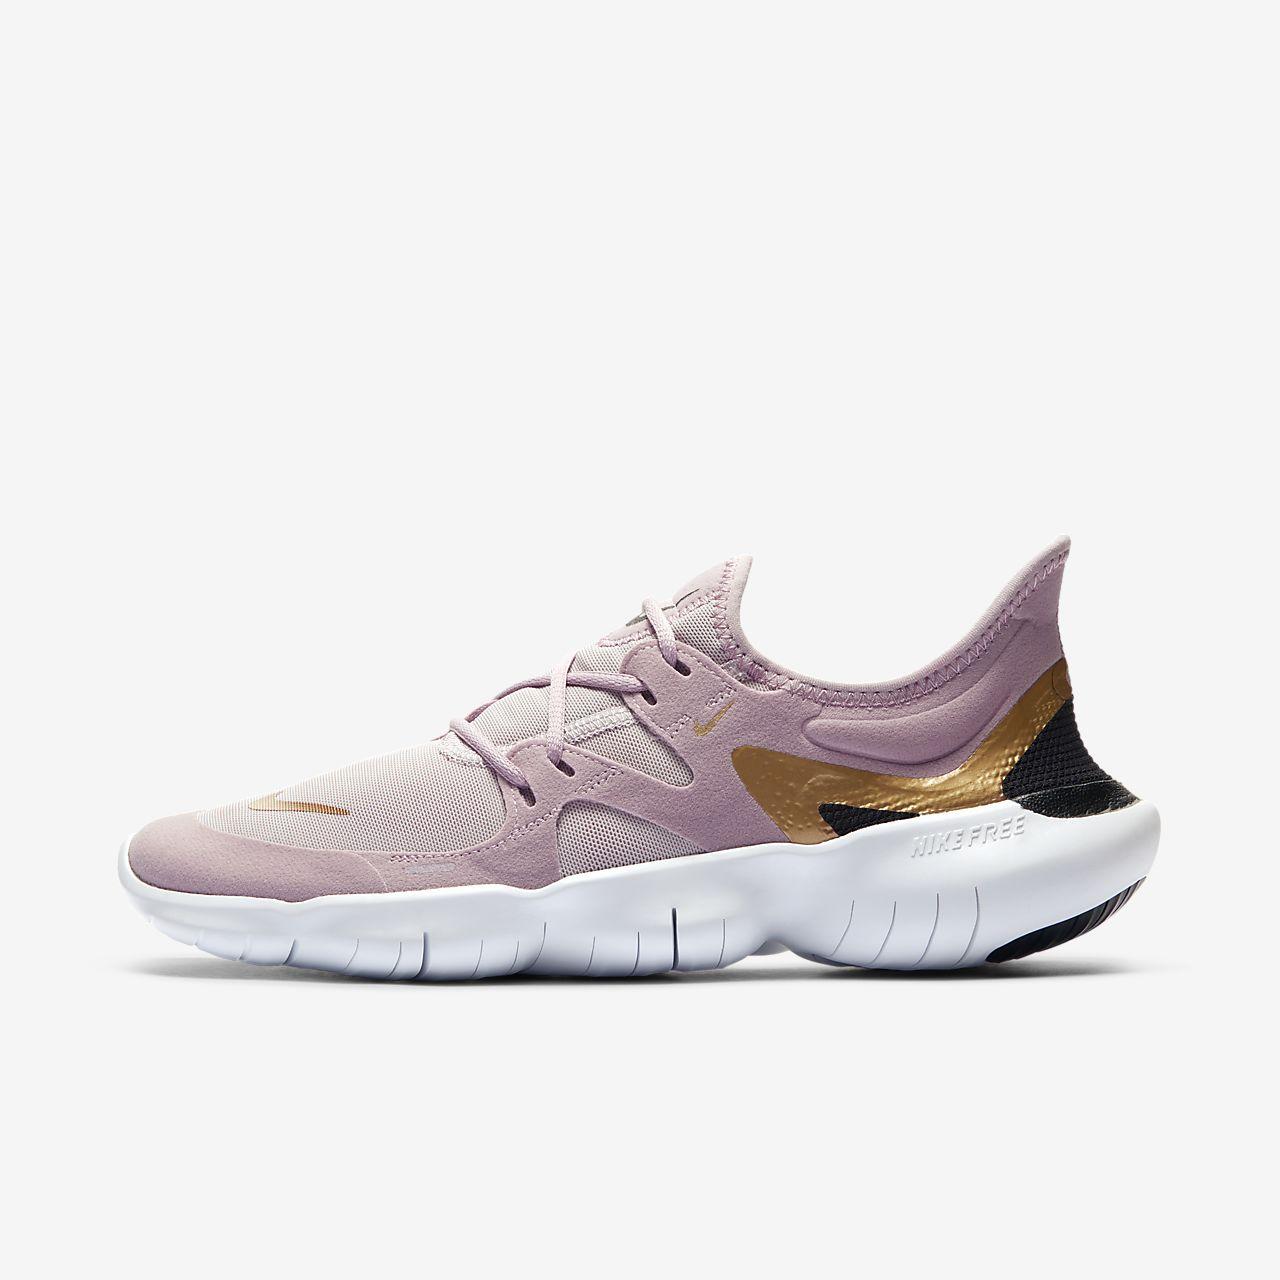 29 Best NIKE FREE images   Nike, Nike free, Sneakers nike